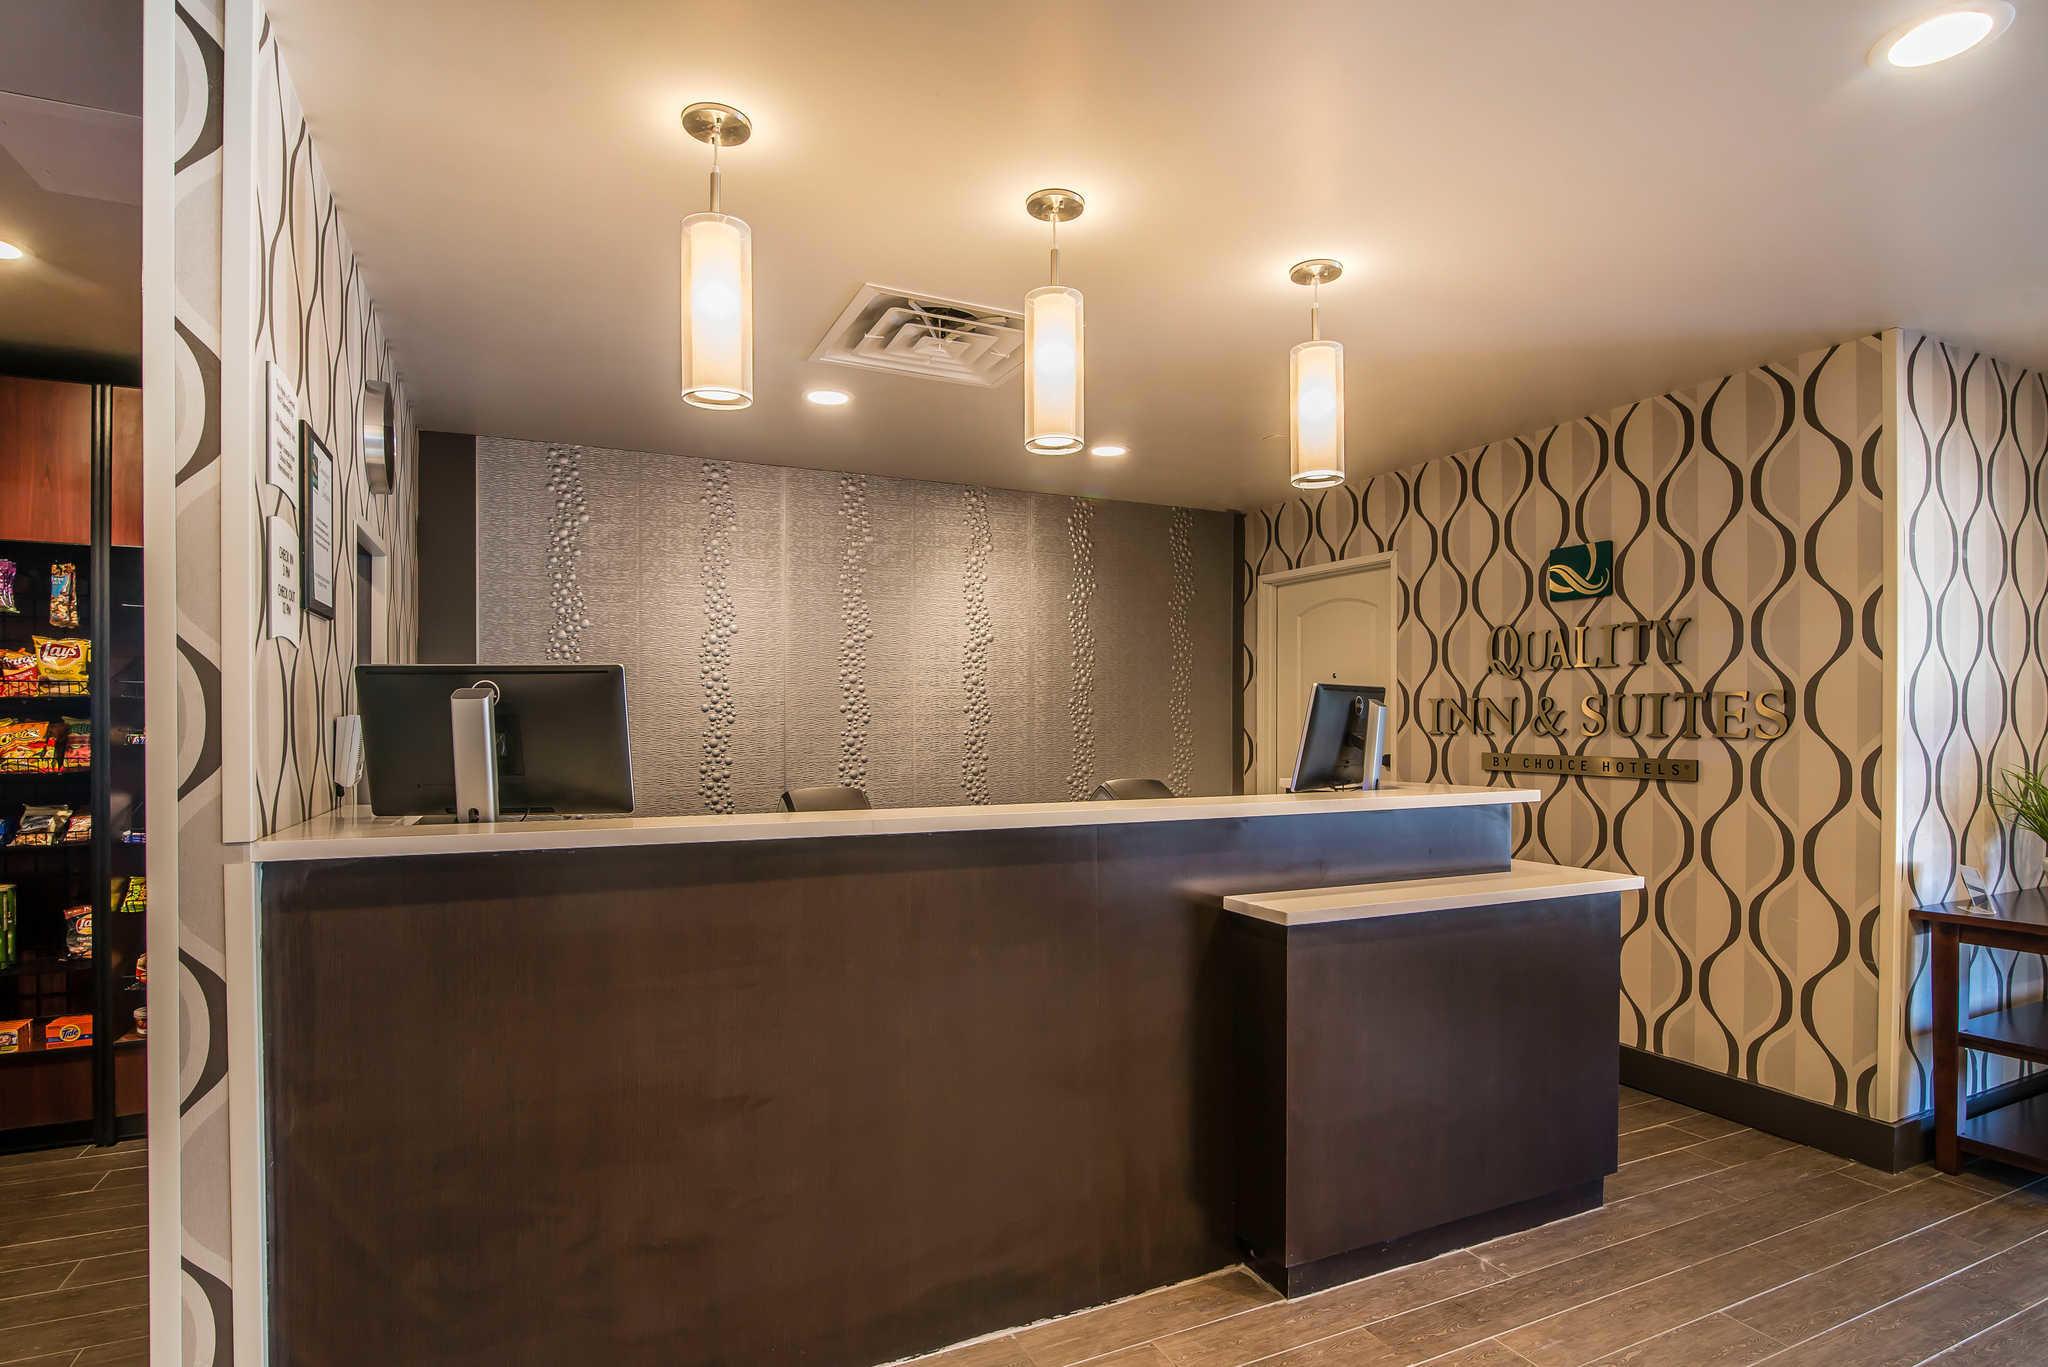 Quality Inn & Suites - Ruidoso Hwy 70 image 3